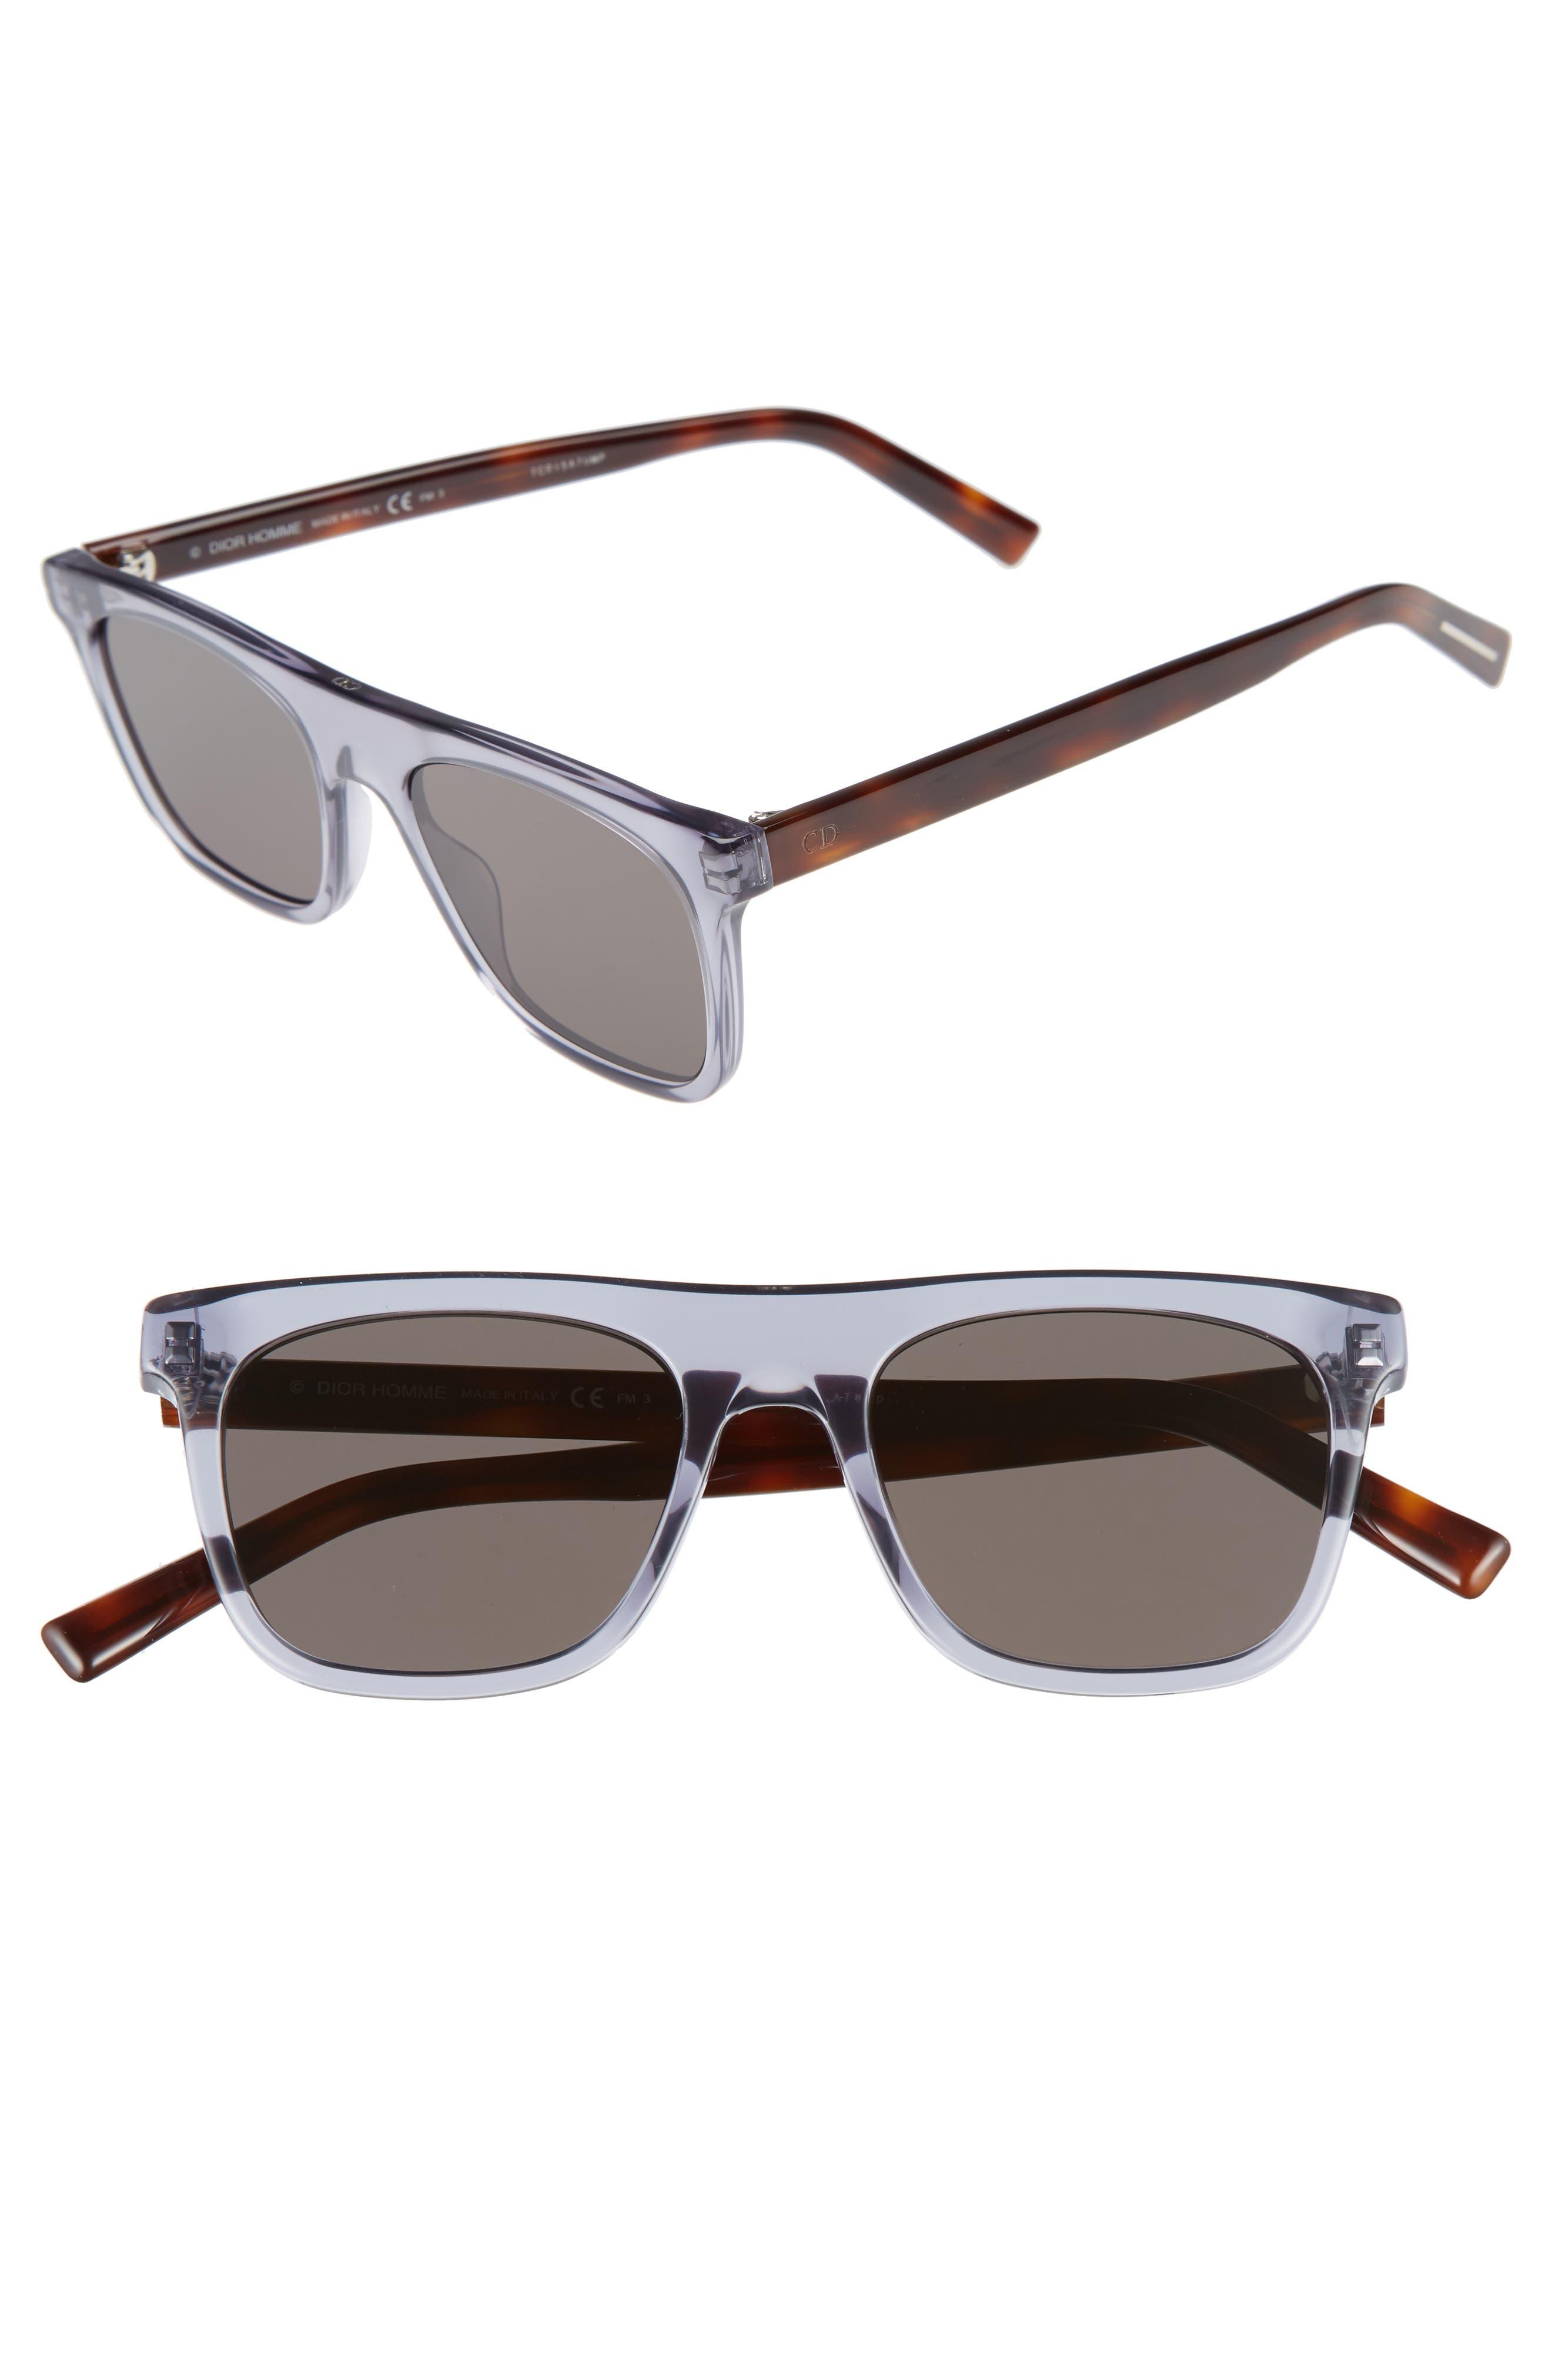 Dior Walk 51mm Sunglasses,                         Main,                         color,